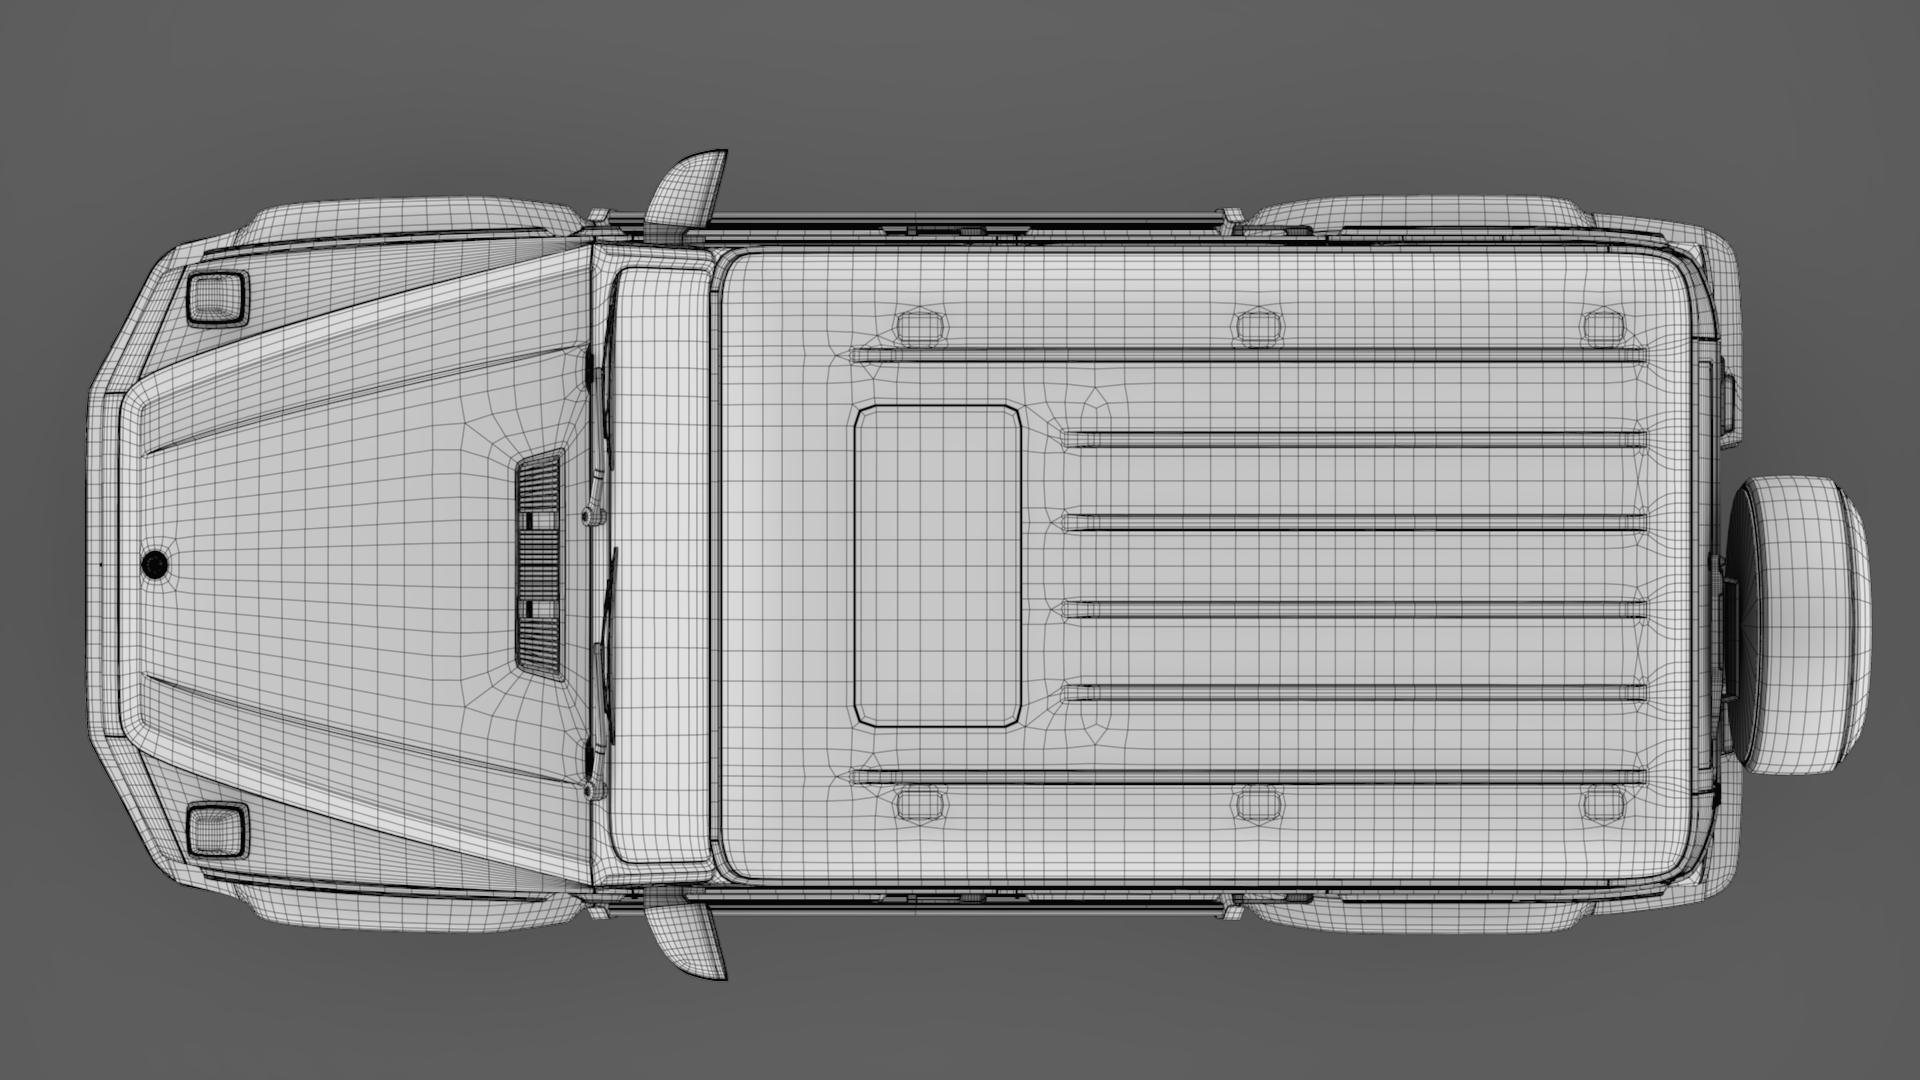 mercedes-benz g 550 (w464) 2018 3d model max fbx c4d lwo ma mb hrc xsi obj 277679